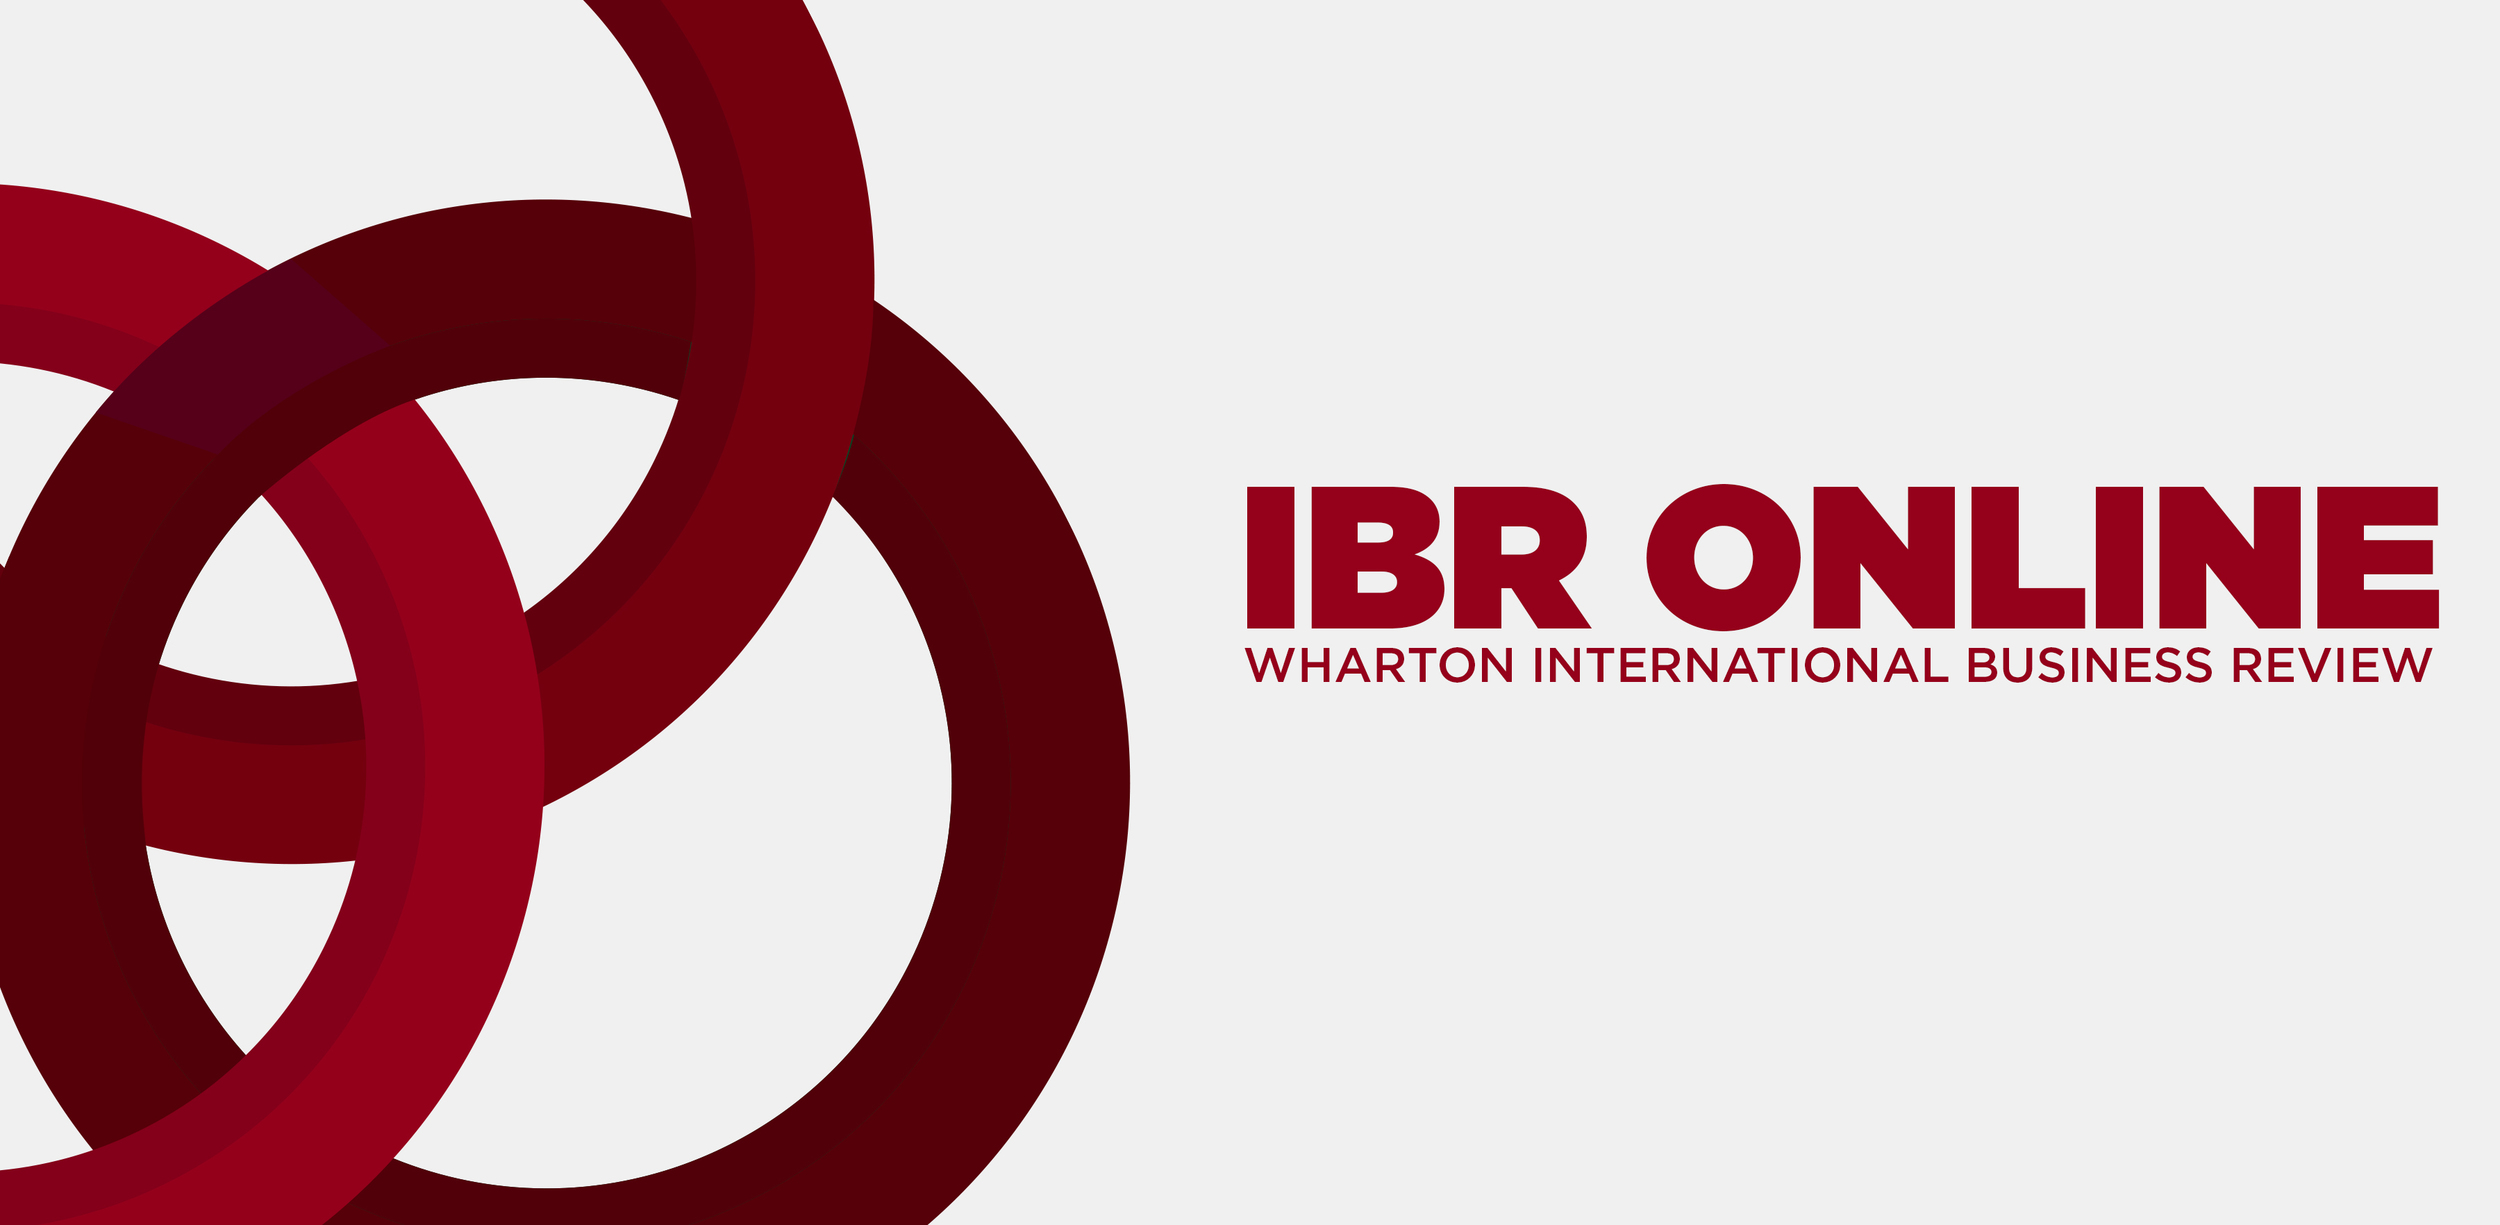 Wharton International Business Review